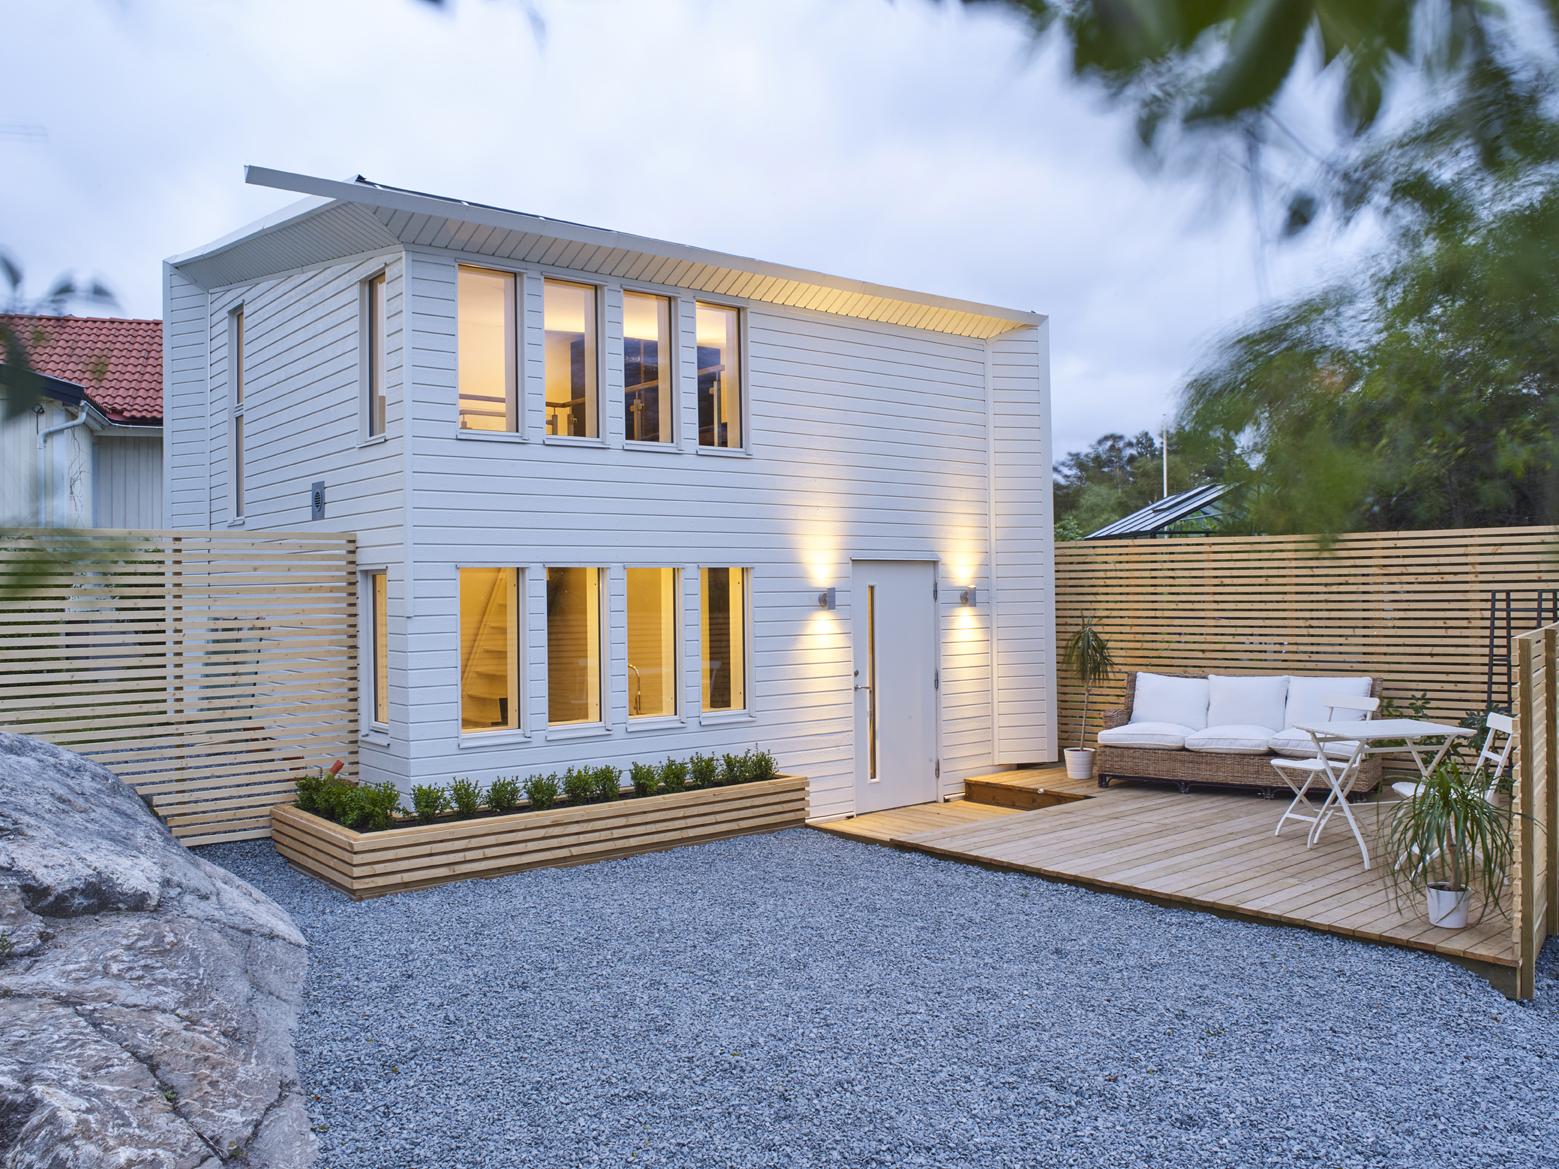 Idyll nra havet - Cottages for Rent in Gteborg / Hjuvik